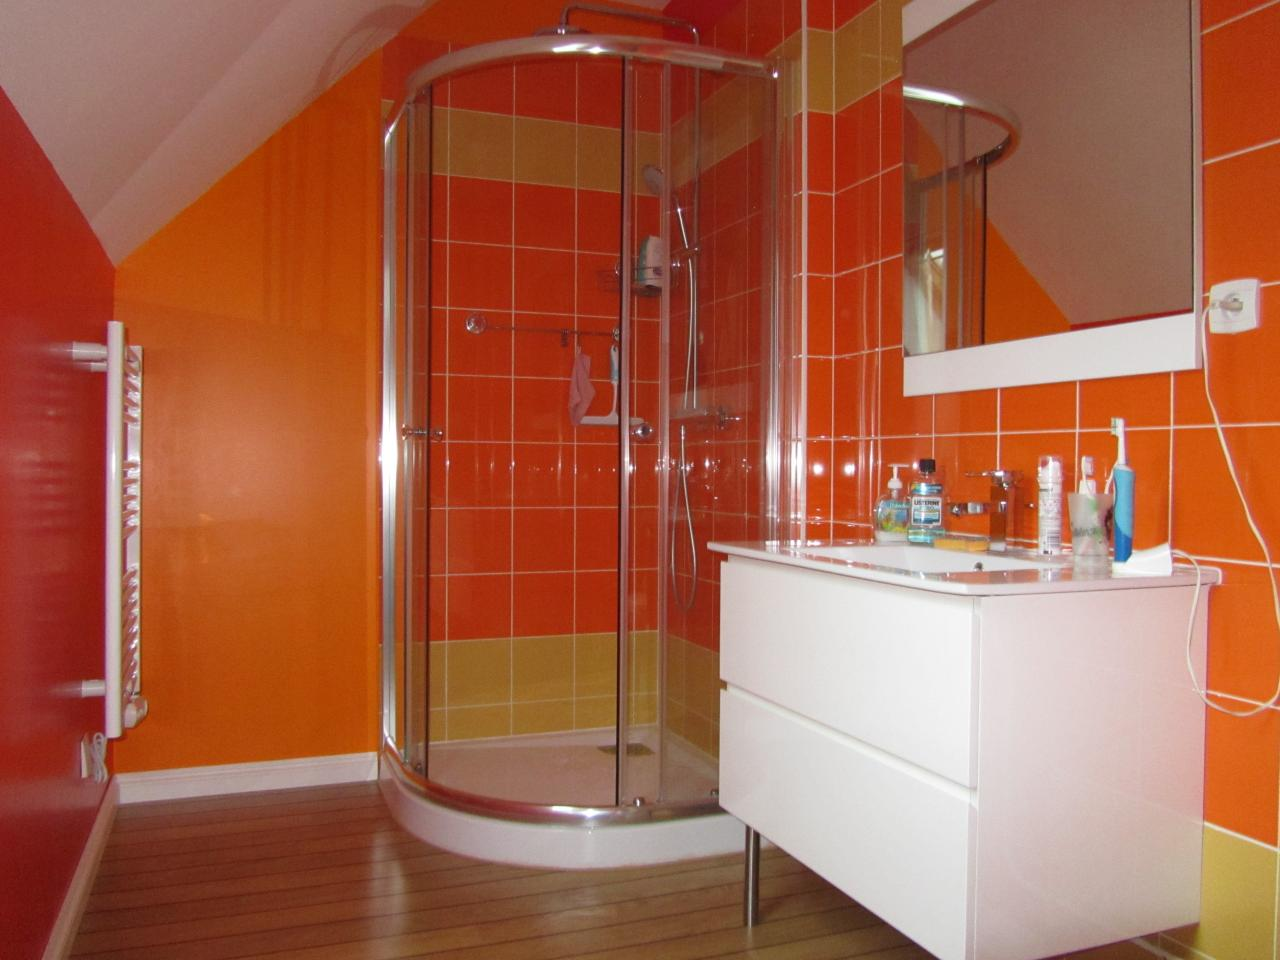 Salle De Bain Orange Et Vert